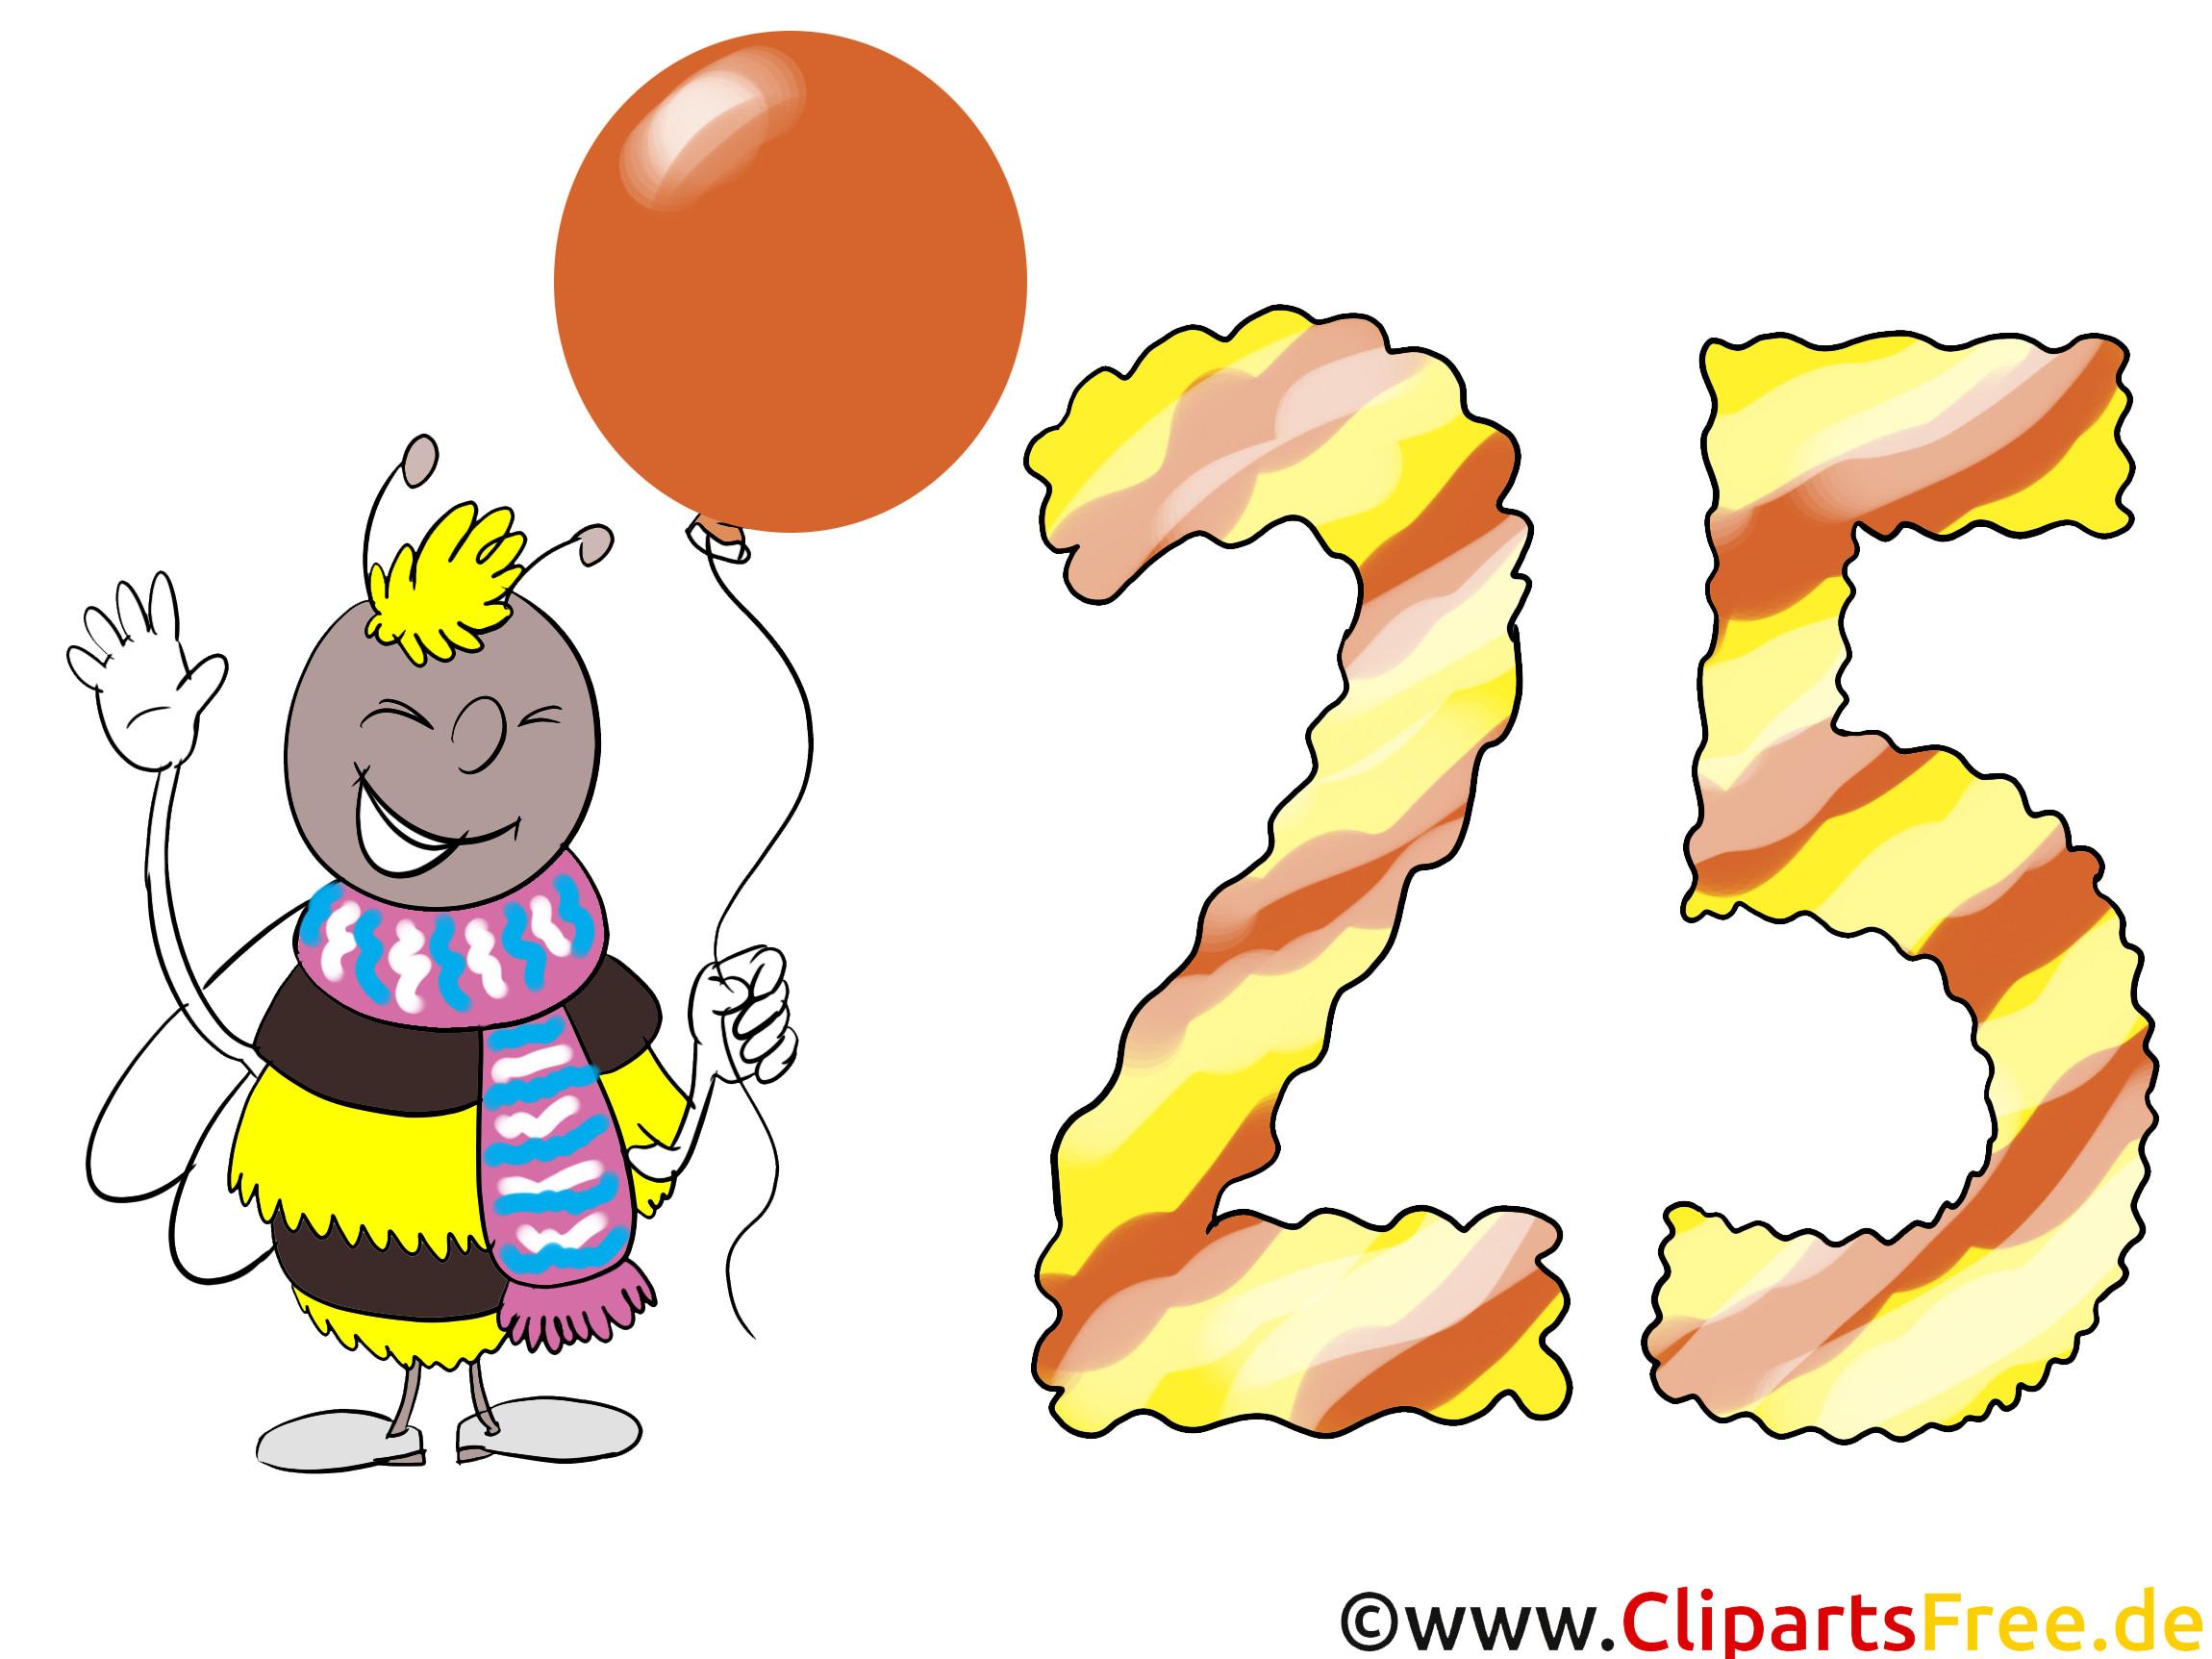 Geburtstagswünsche Zum 25  Geburtstagswünsche zum 25 Geburtstag Karte Clipart